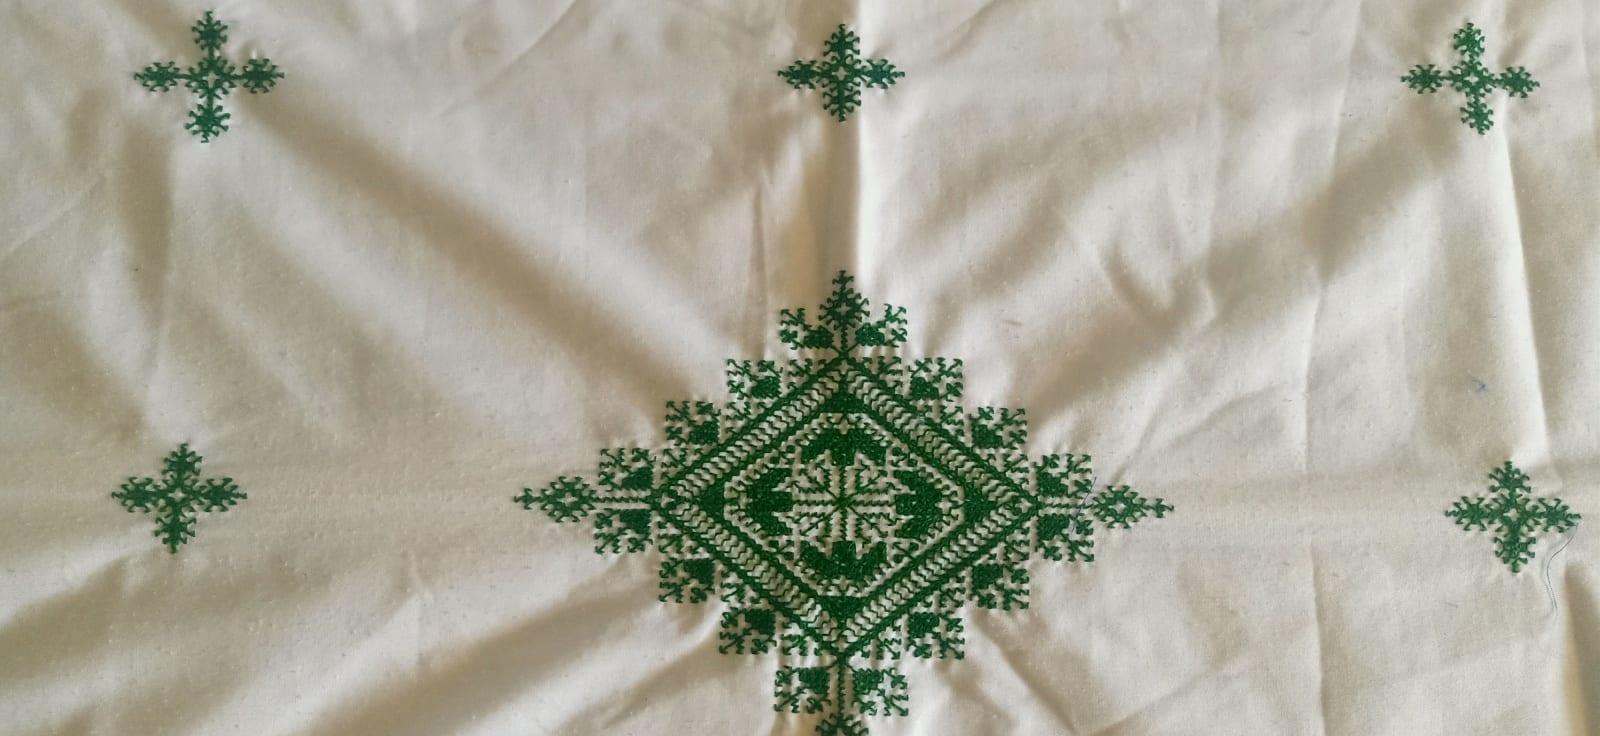 tawel  Green, White Morocco